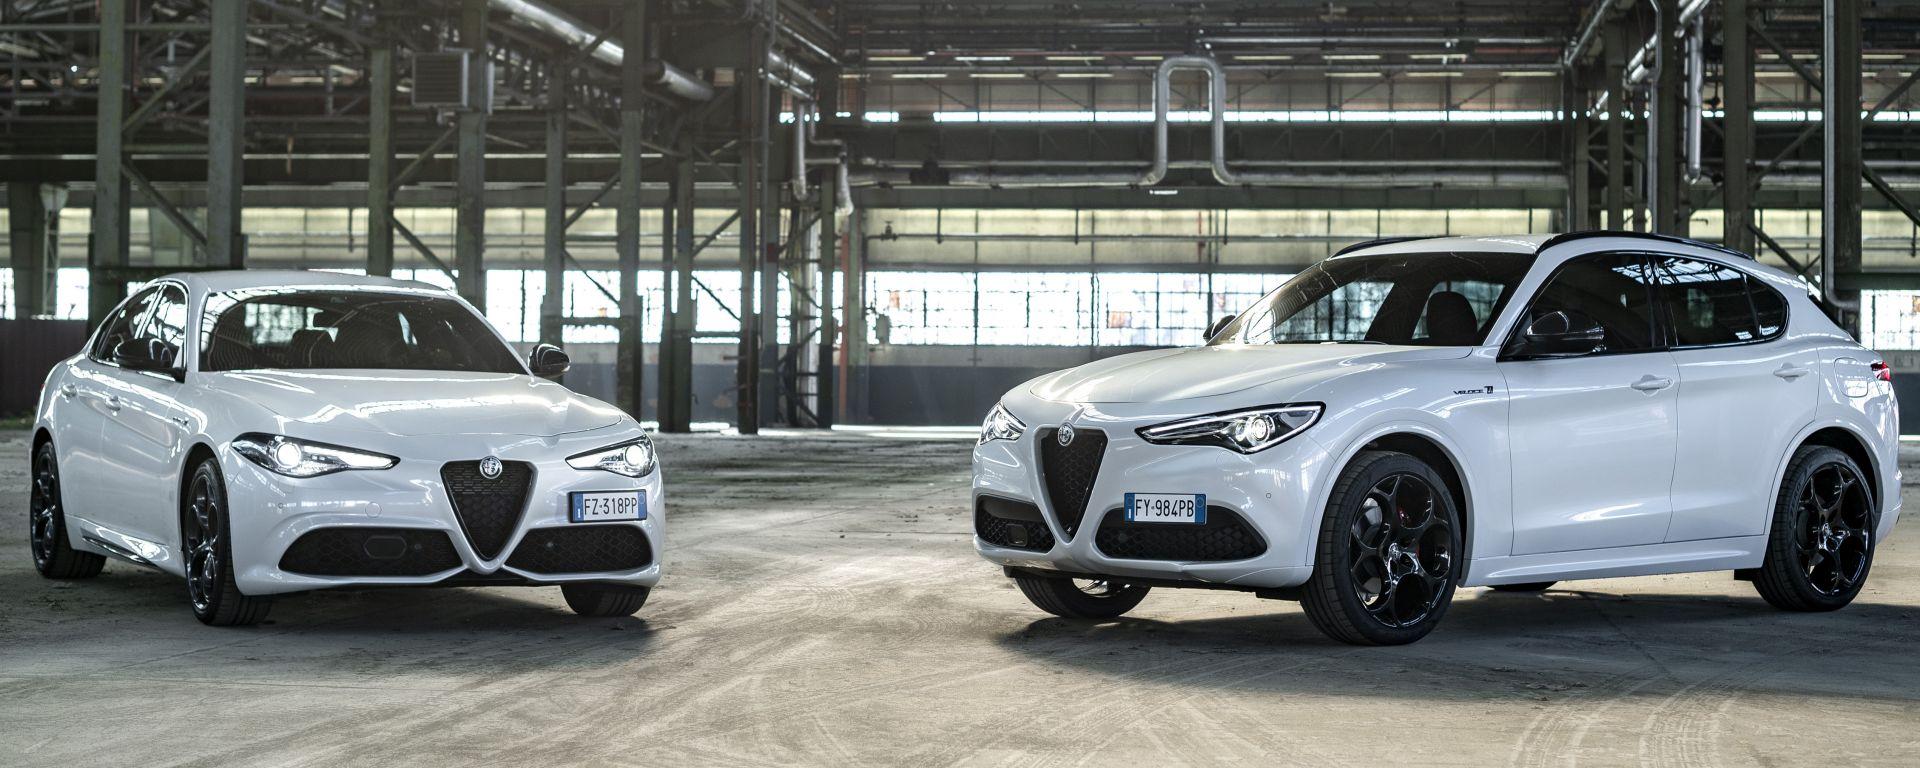 Alfa Romeo Giulia e Stelvio MY21